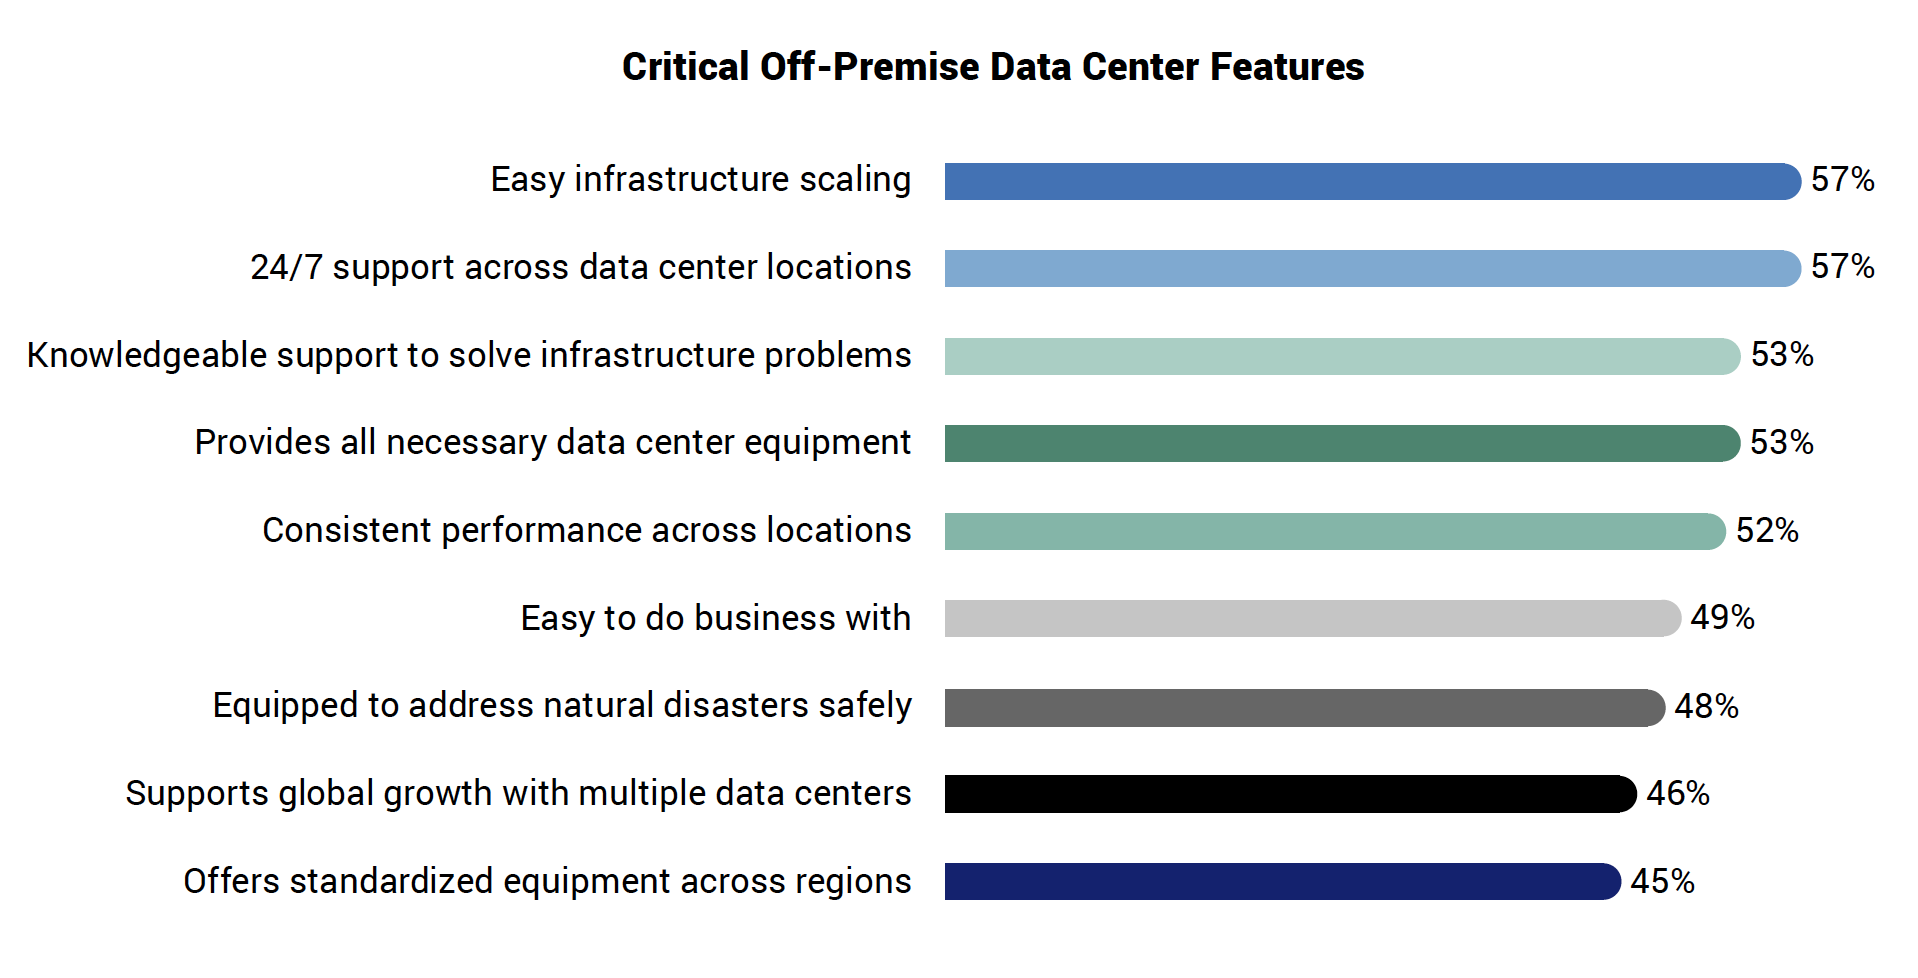 Critical Off-Premise Data Center Features